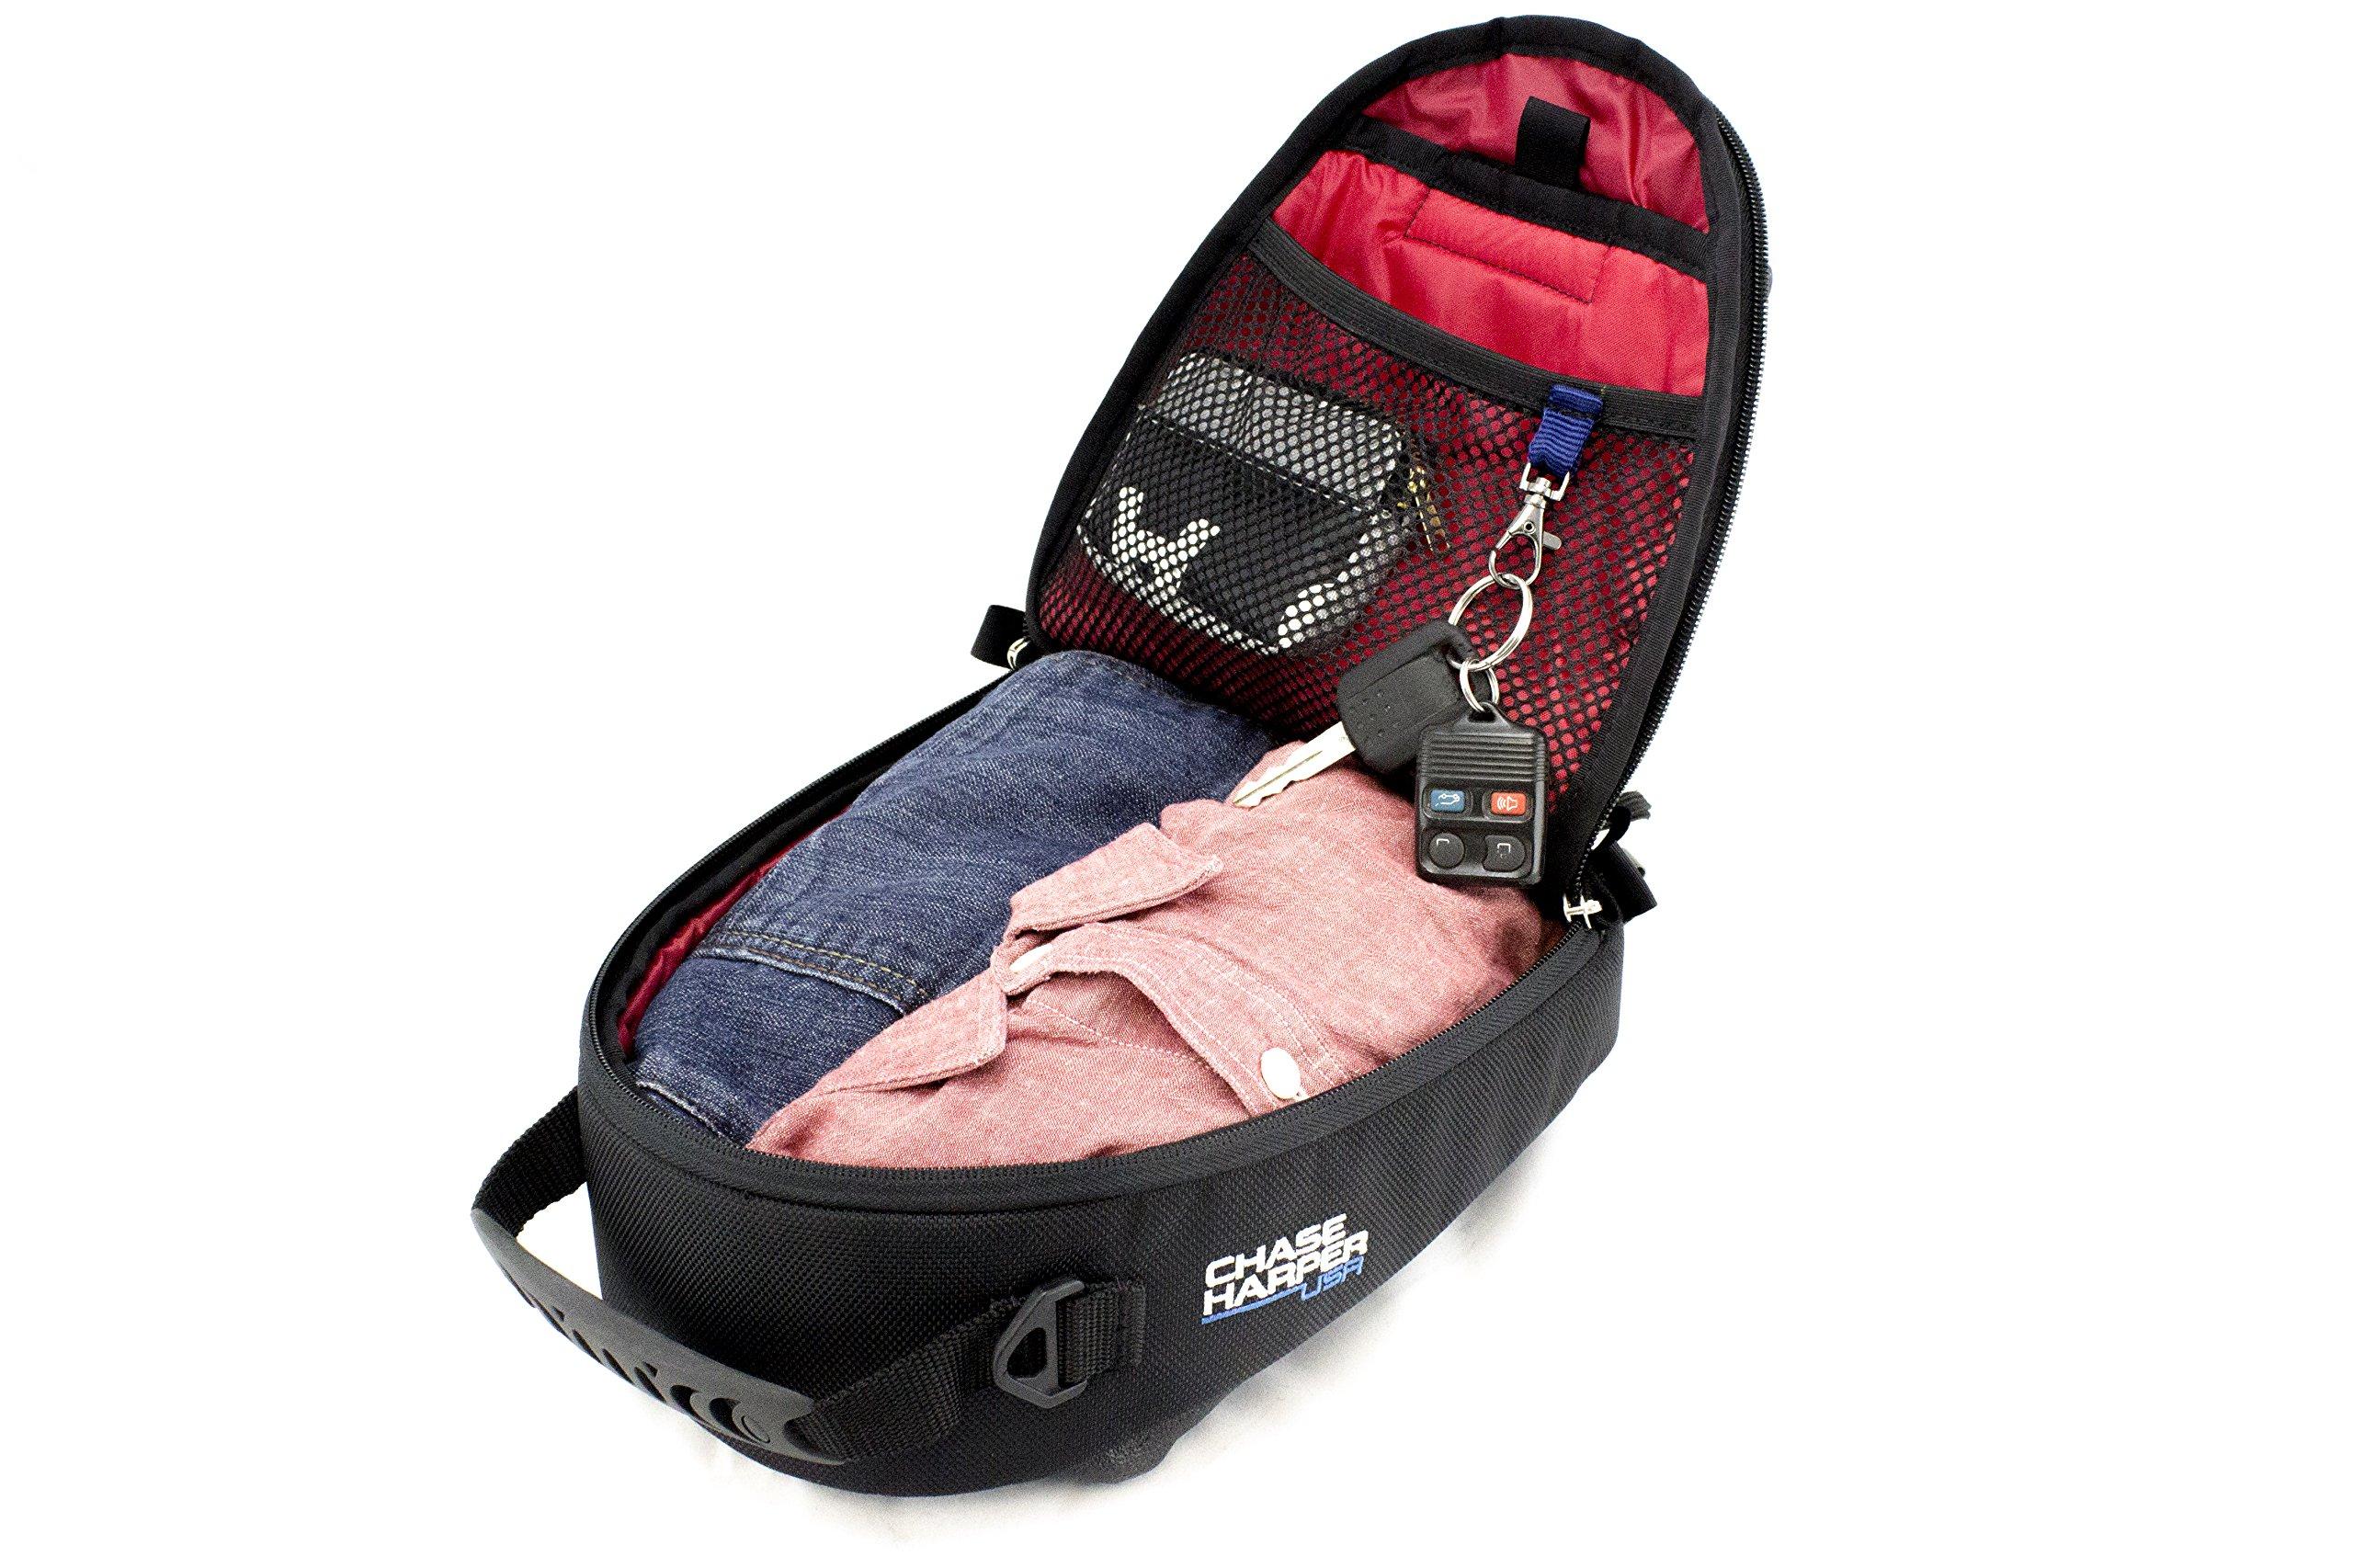 Chase Harper 450BCNW - Tankbag Strap Mount